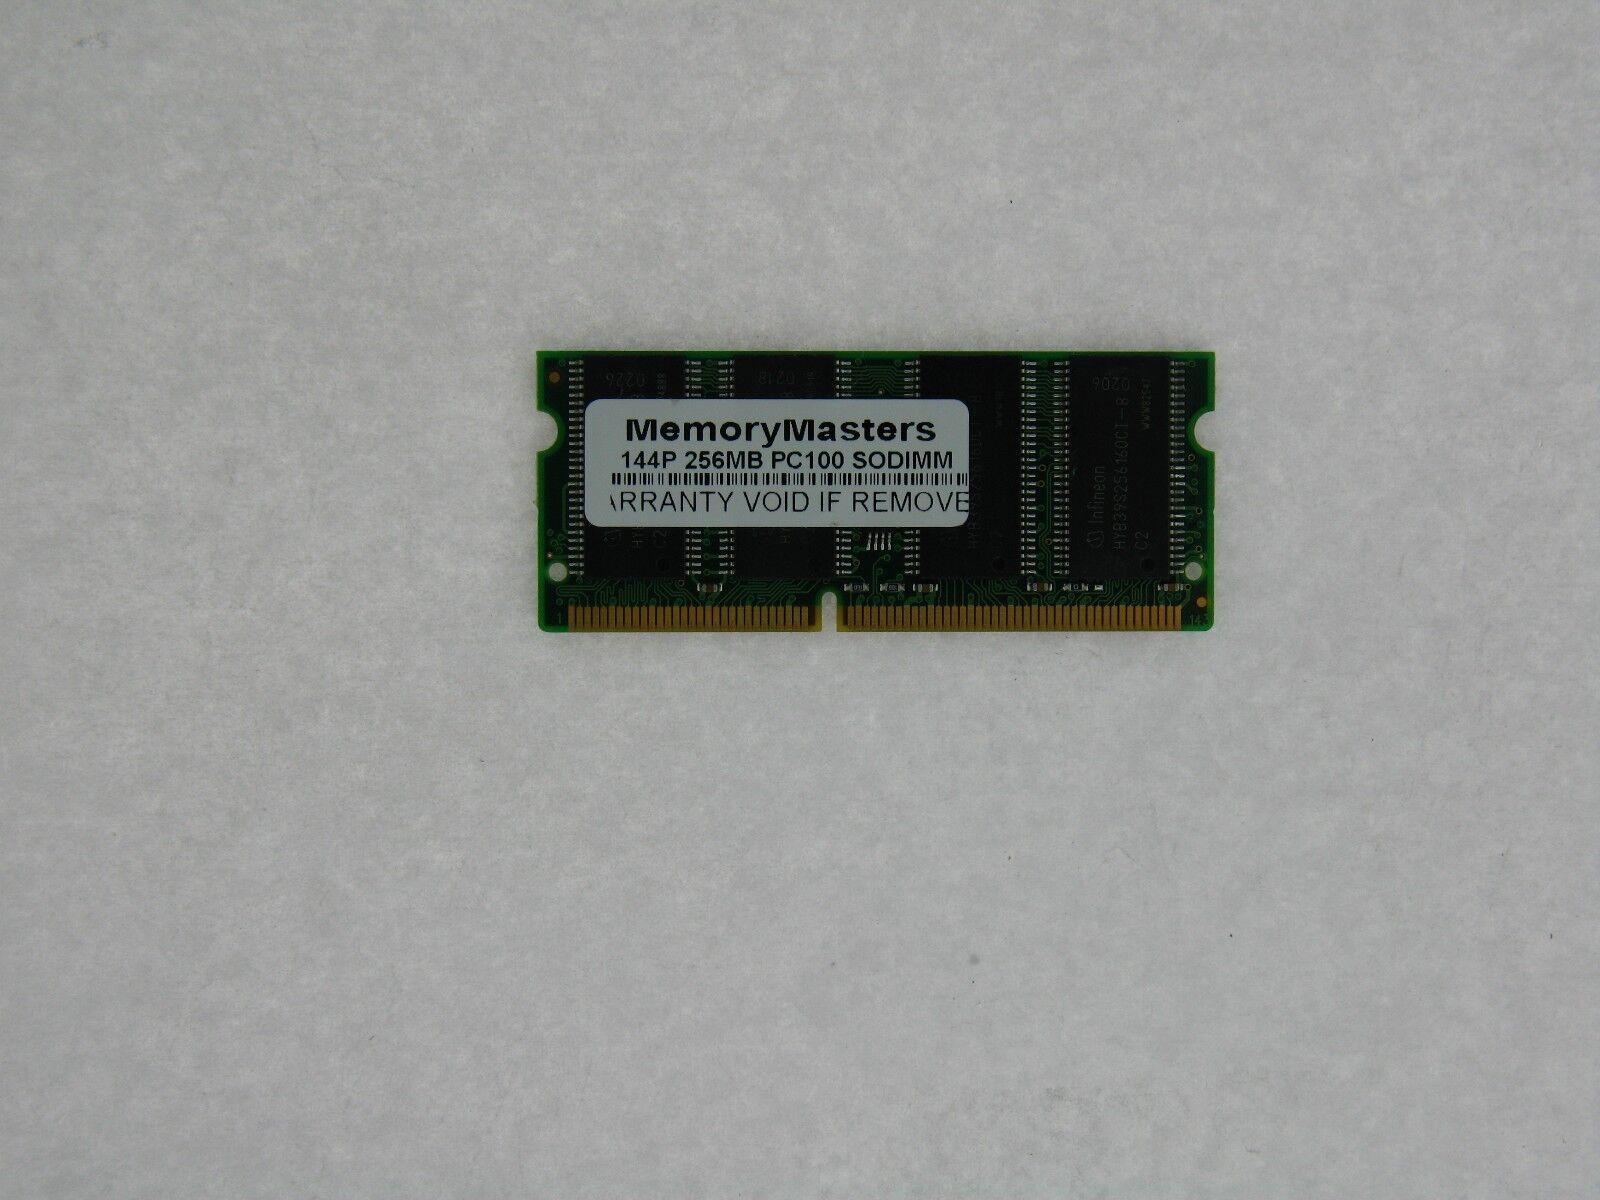 256MB  SDRAM MEMORY RAM PC100 SODIMM 144-PIN 100MHZ